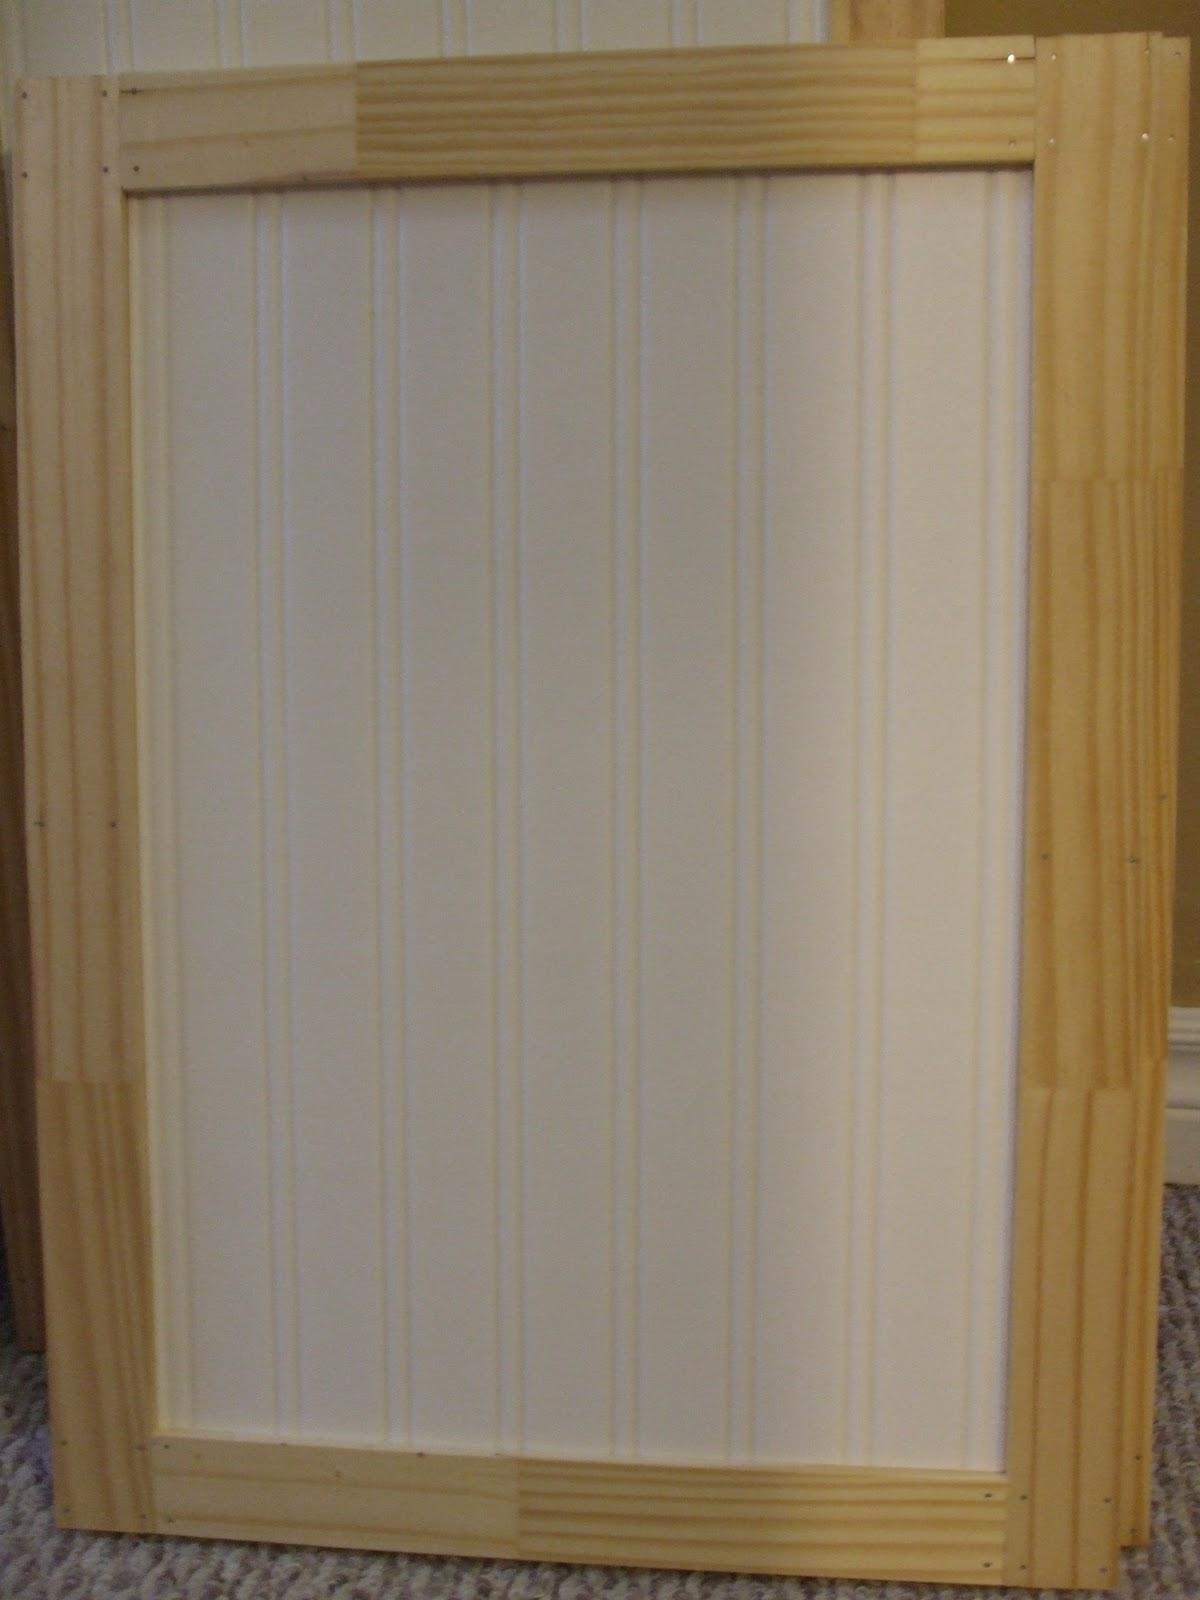 pososibo Wallpaper Kitchen Cabinet Doors 1200x1600